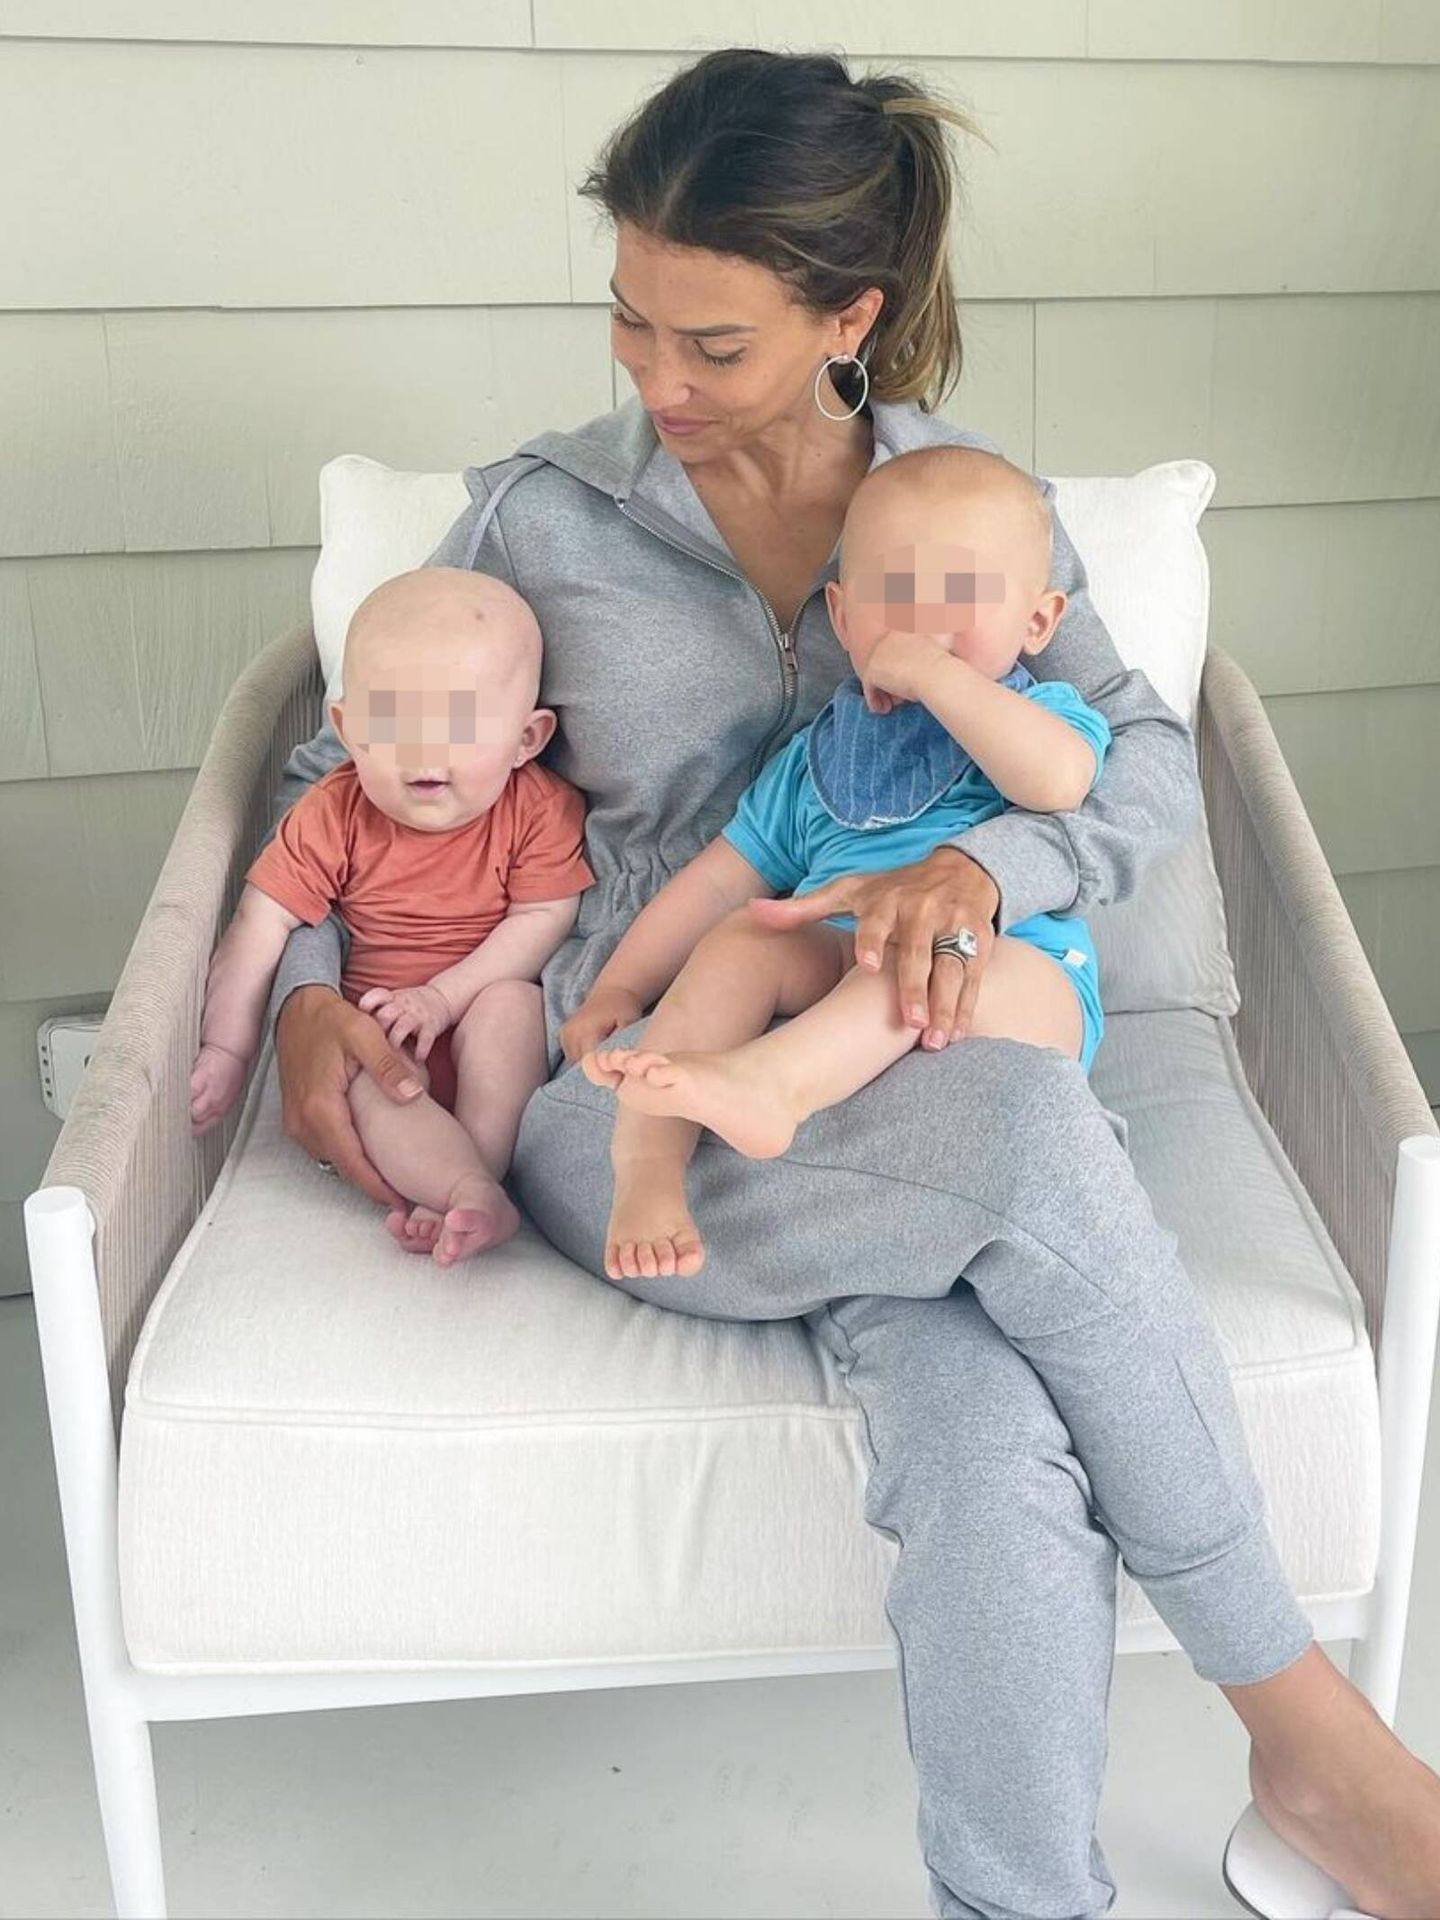 Hilaria con Edu y Marilu, sus bebés arcoíris. (Instagram @hilariabaldwin)